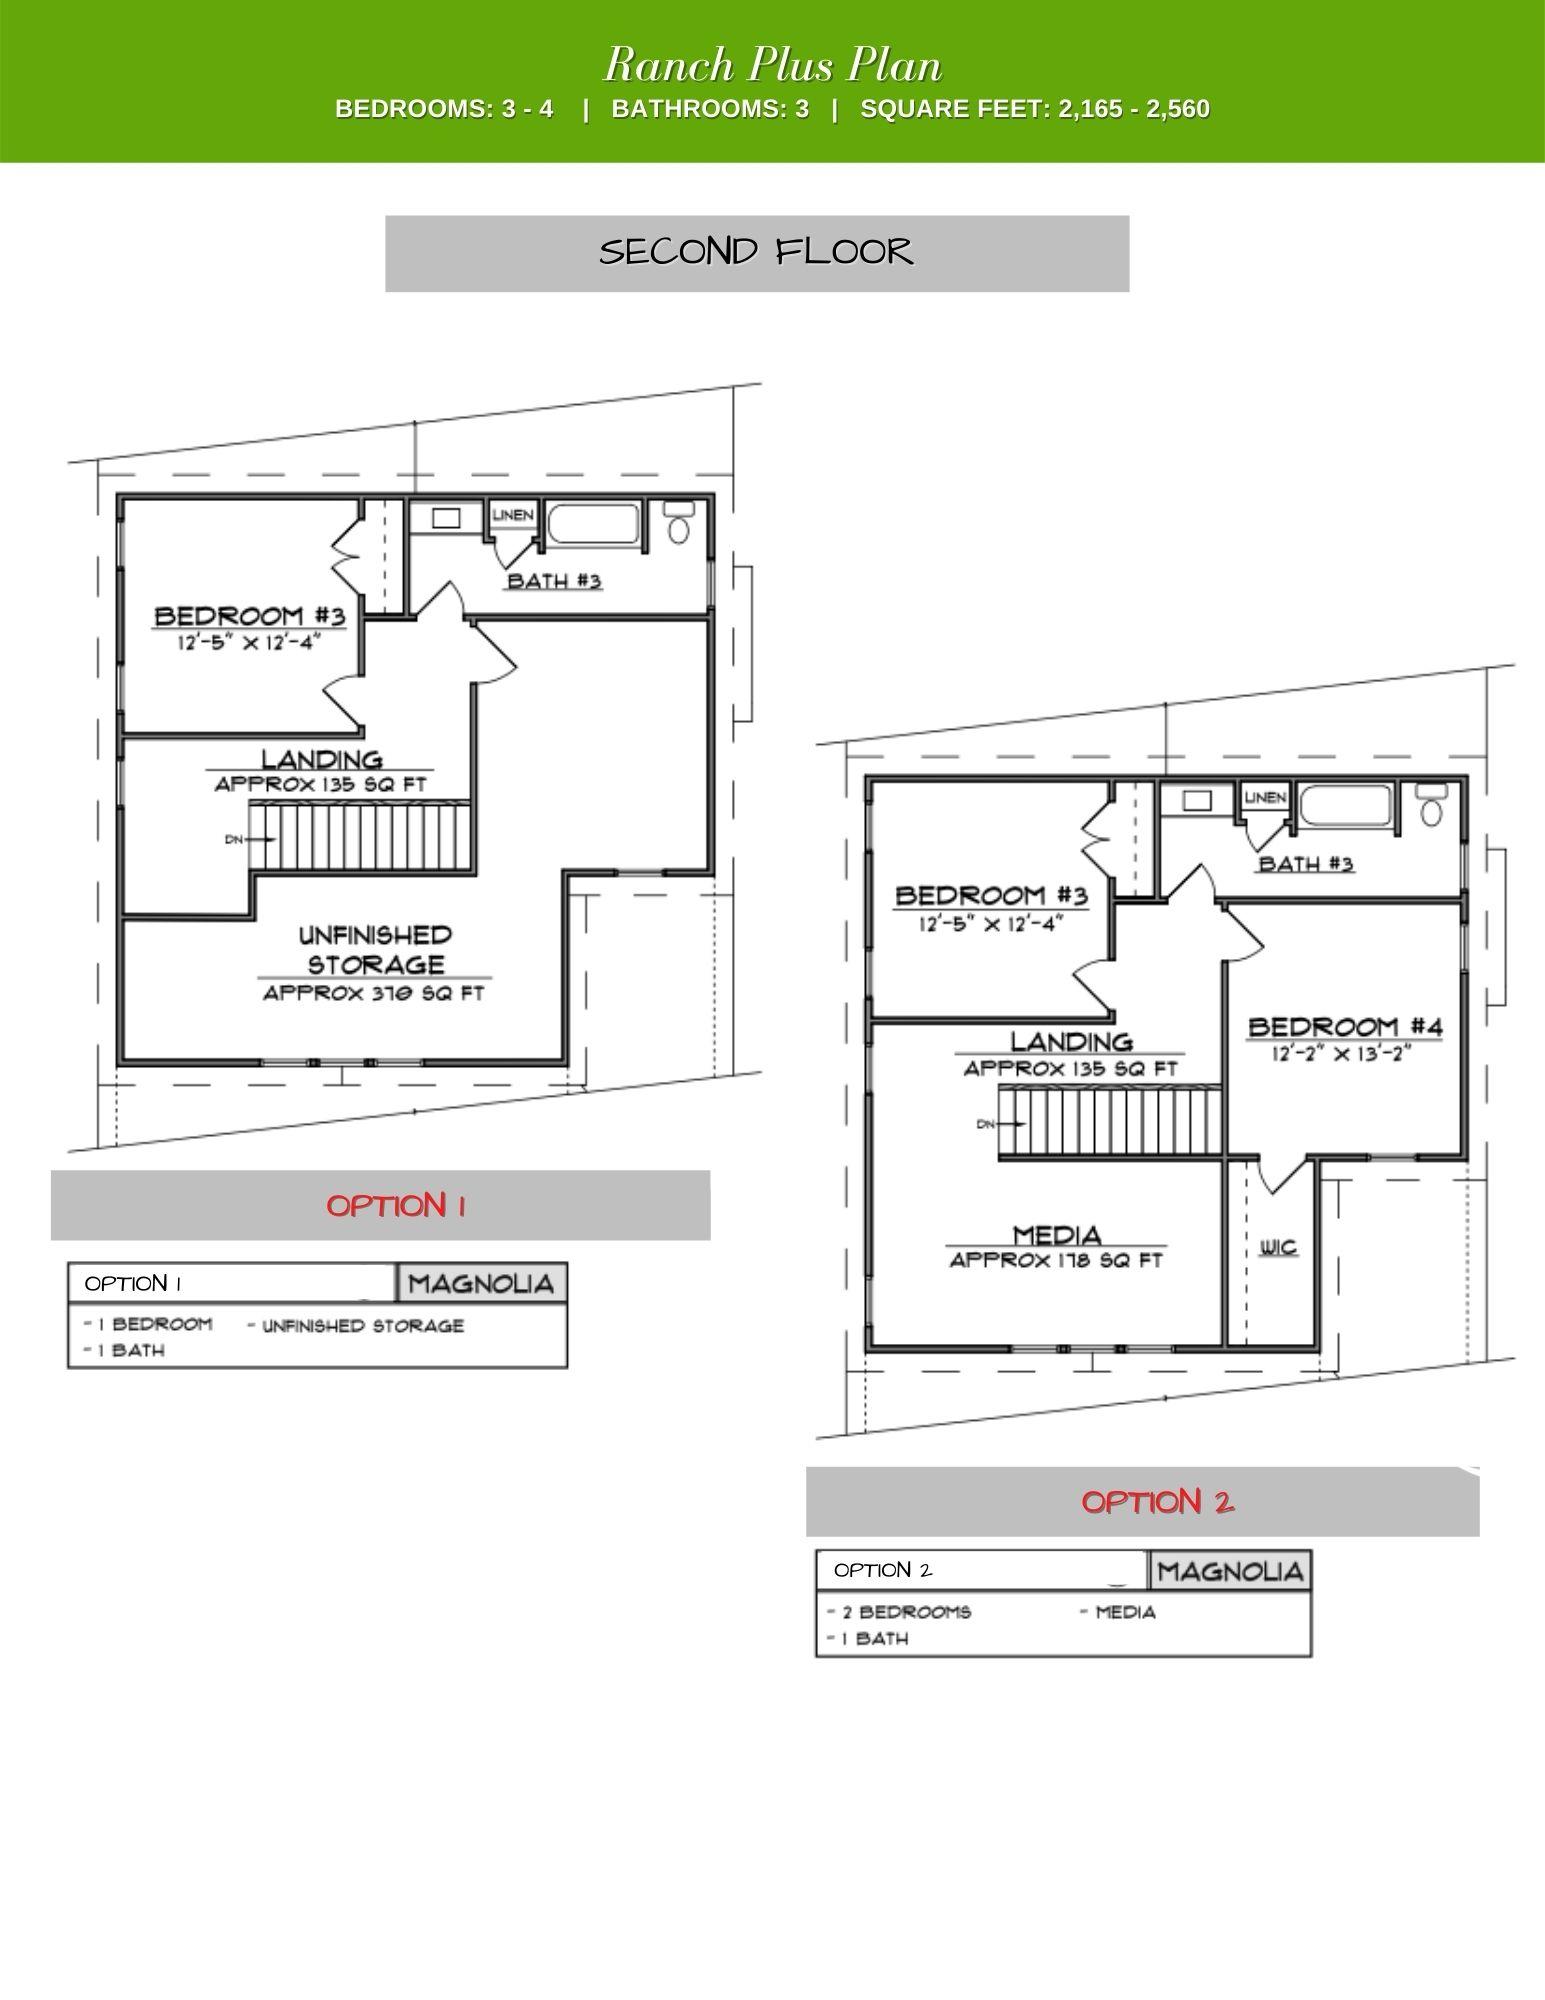 Magnolia 2nd Floor Plan Options